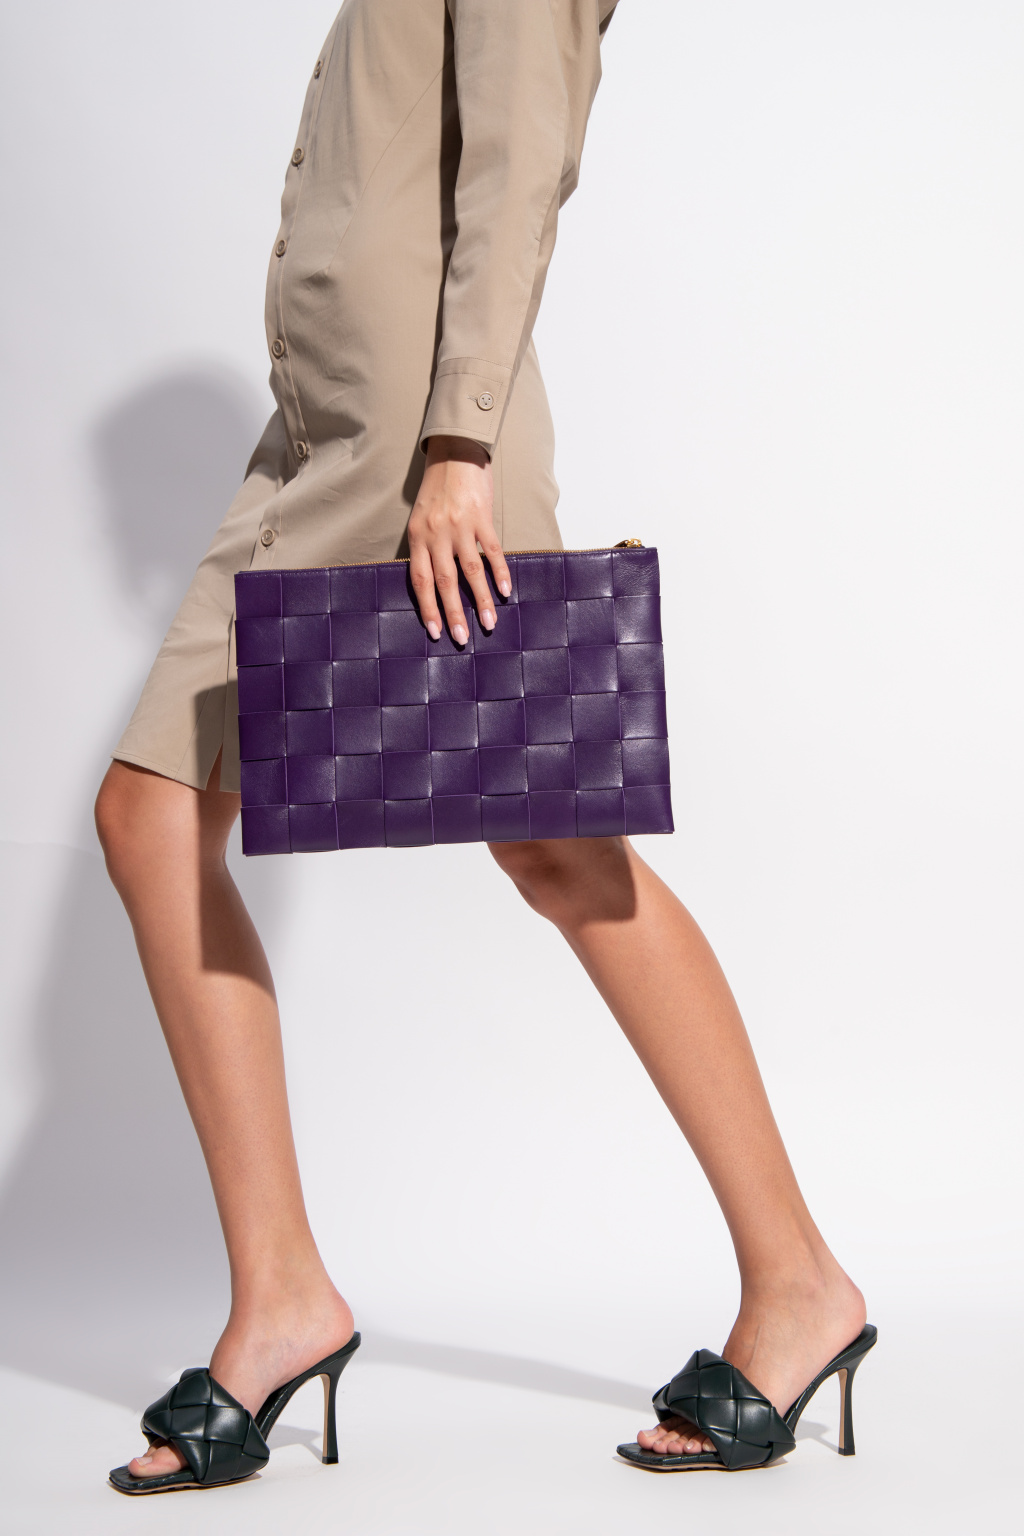 Bottega Veneta Clutch with 'Intrecciato' weave